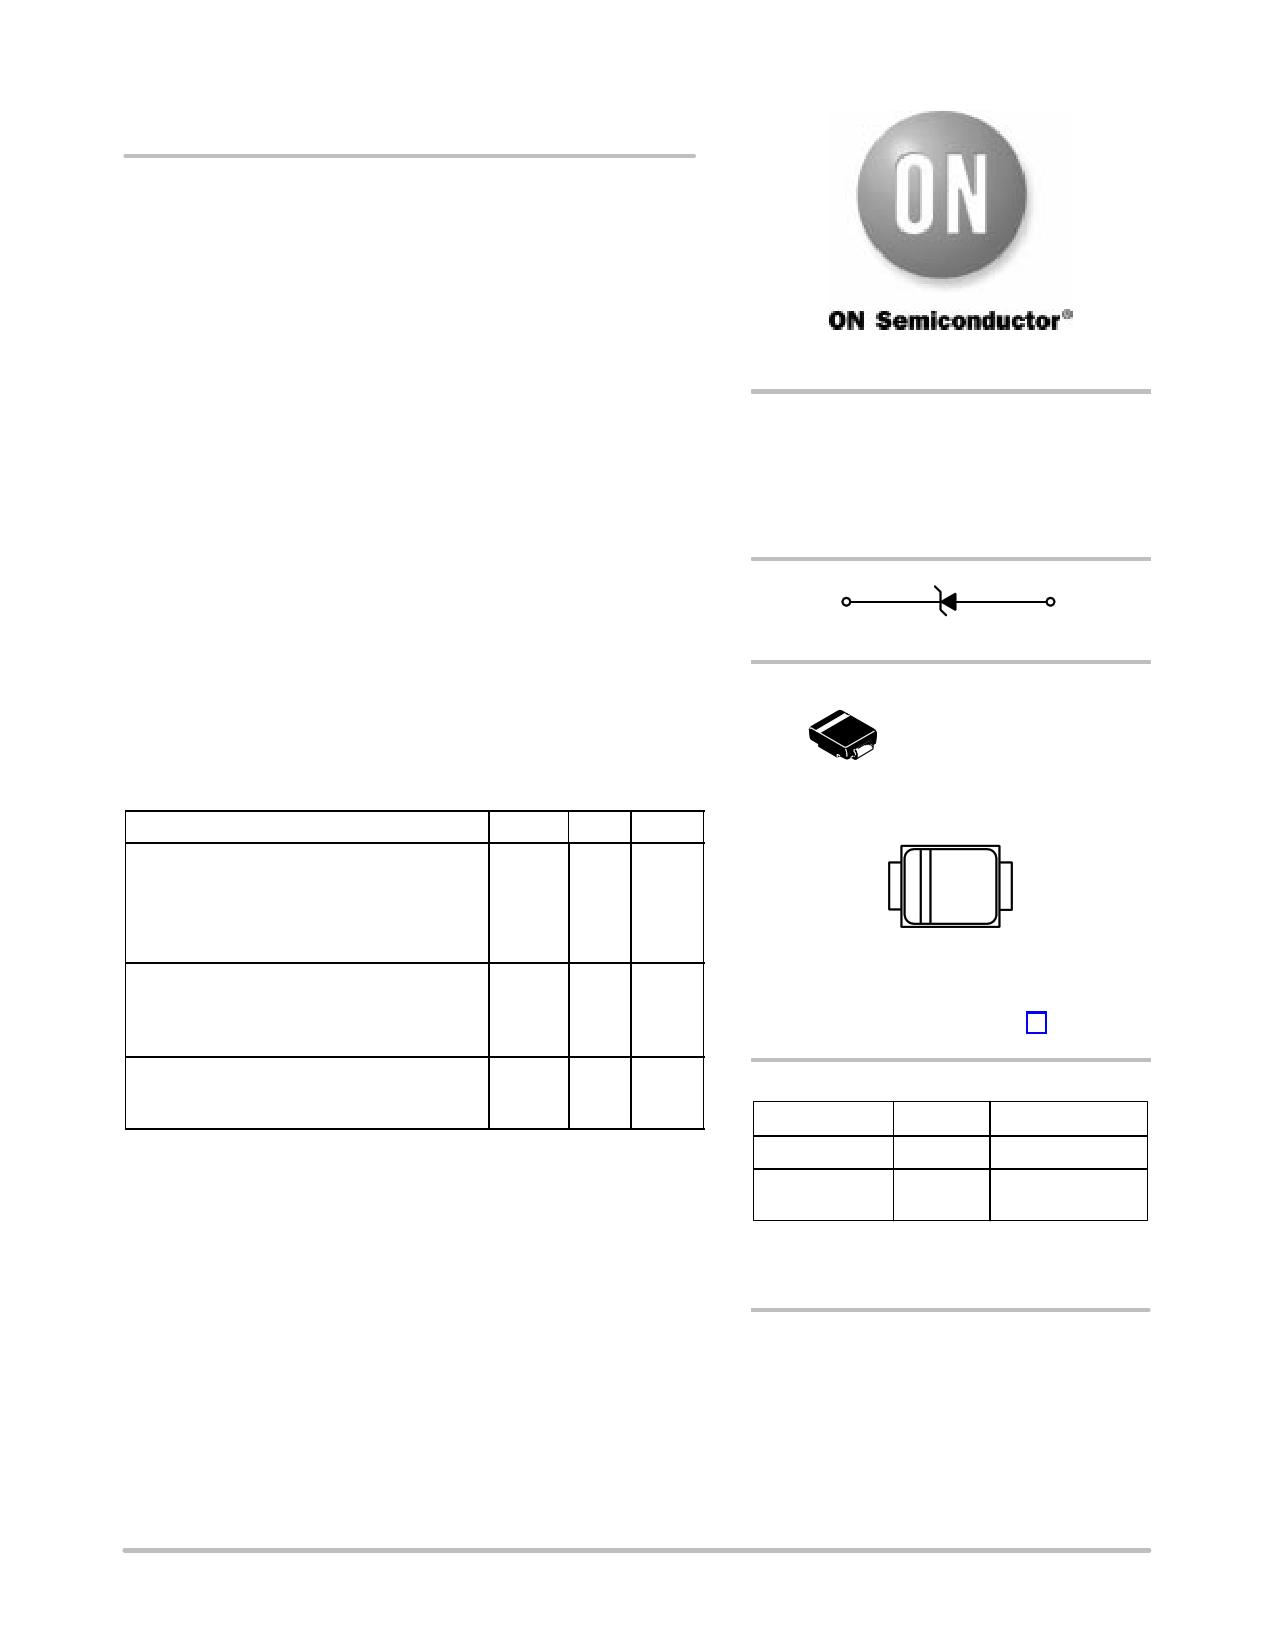 1SMB5914BT3 datasheet